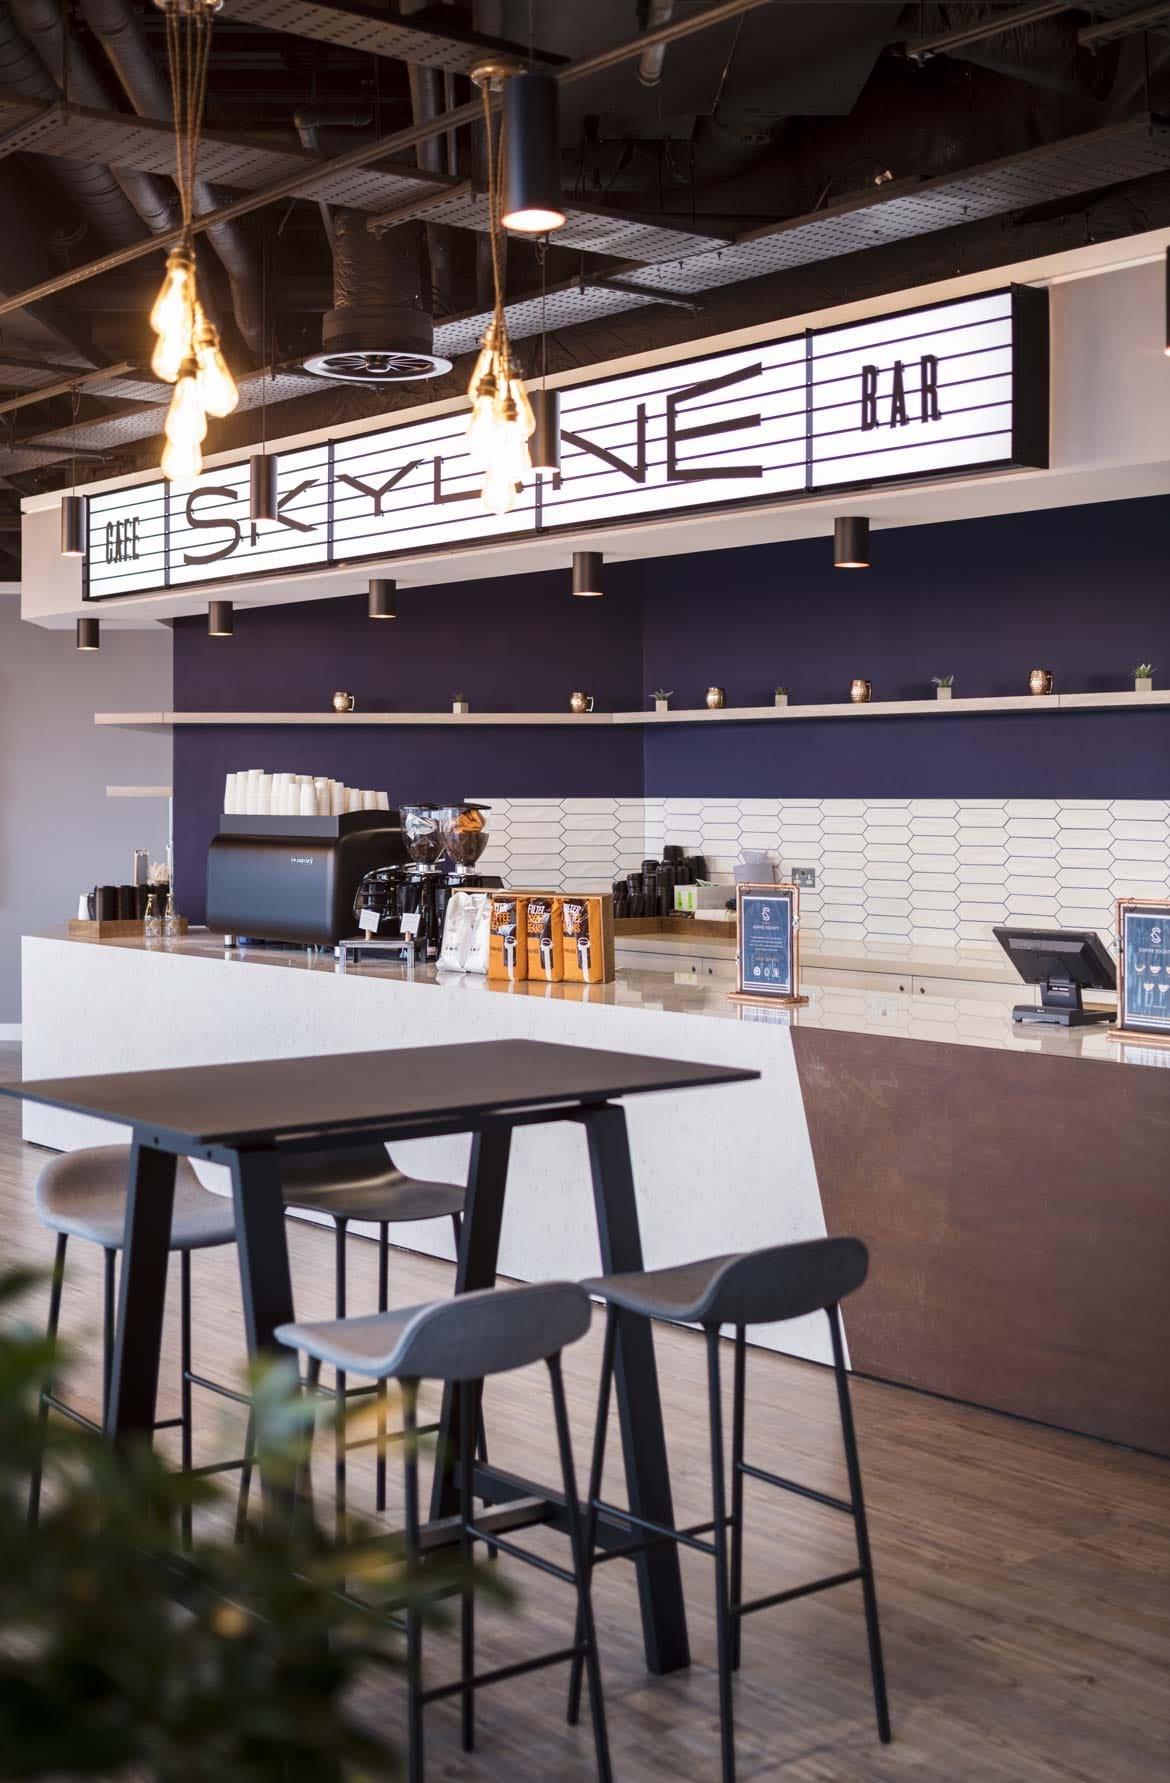 NBC Universal – Skyline coffee bar